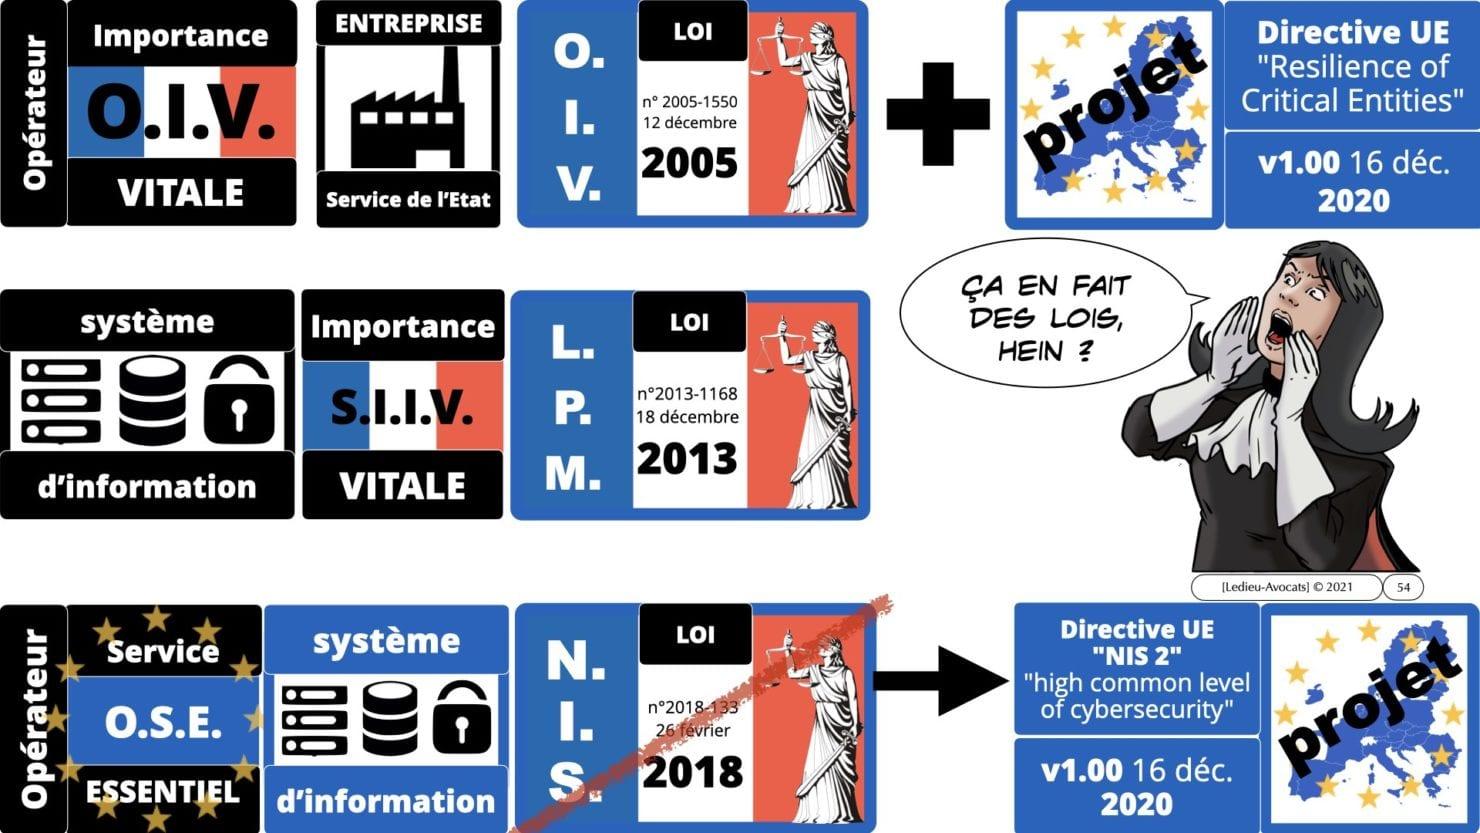 337 cyber sécurité #1 OIV OSE Critical Entities © Ledieu-avocat 15-06-2021.054